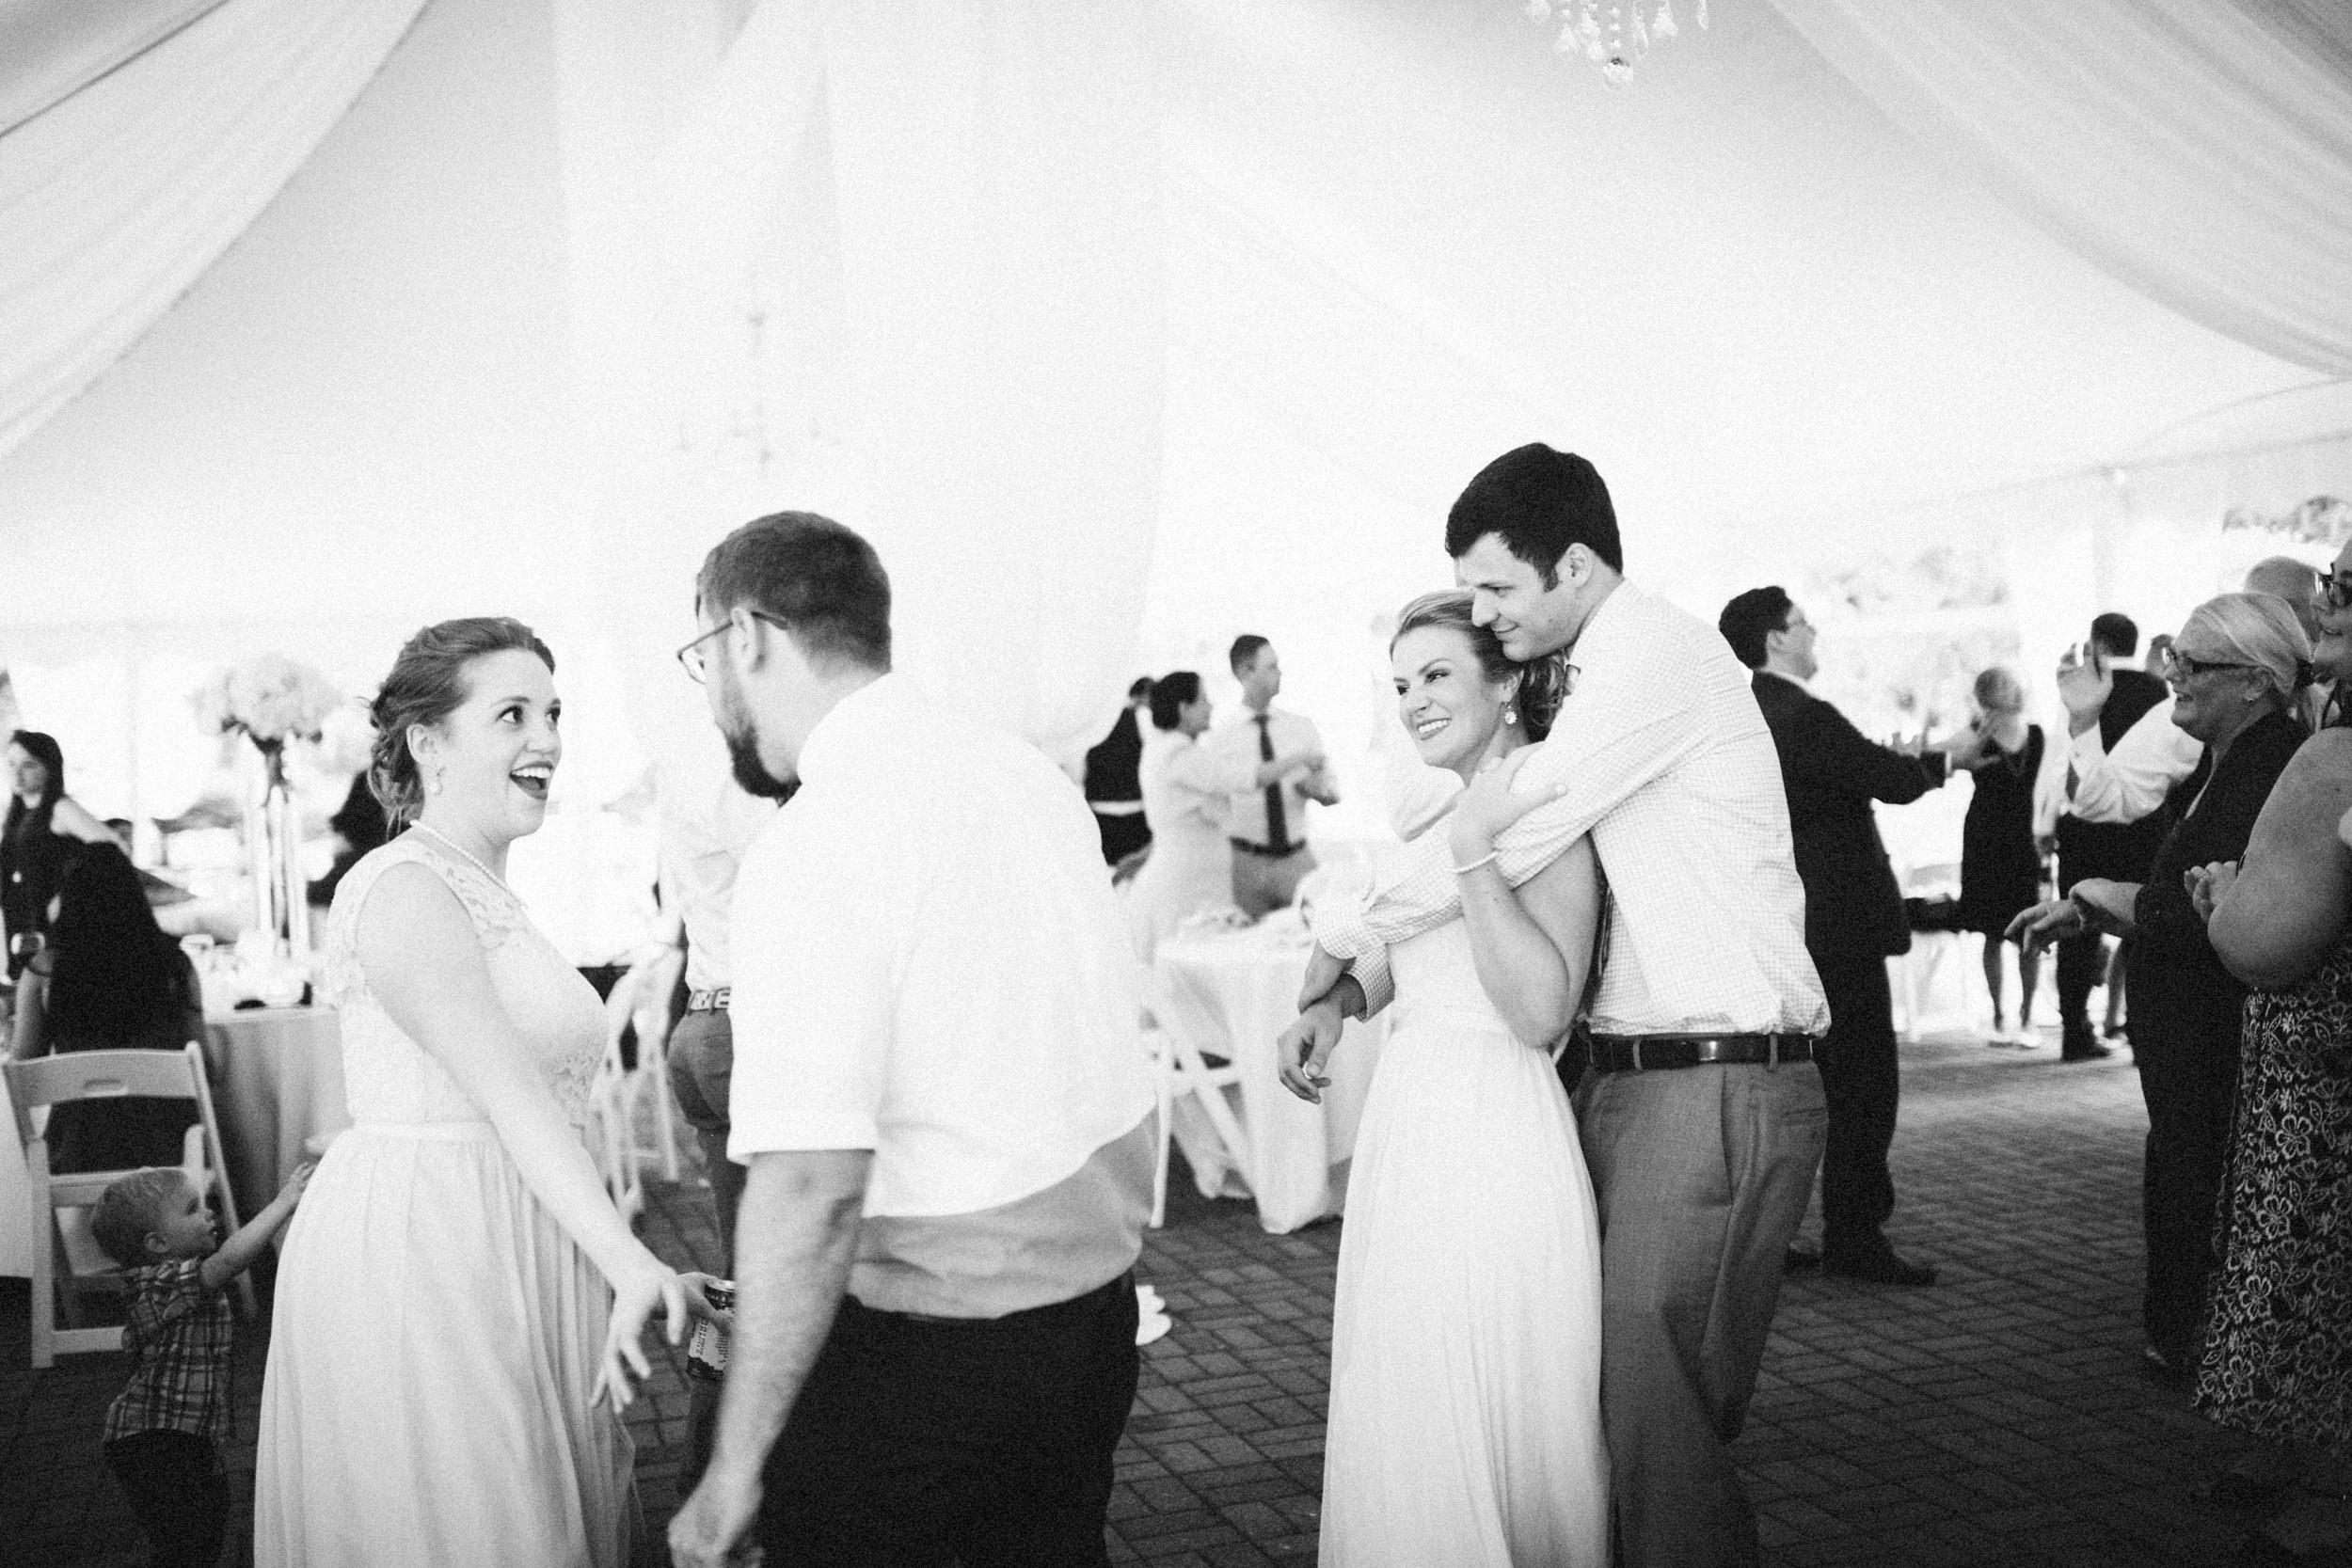 Louisville-Kentucky-Wedding-Elopement-Photographer-Sarah-Katherine-Davis-Photography-Whitehall-Classic-Timeless-Garden-Wedding-765.jpg